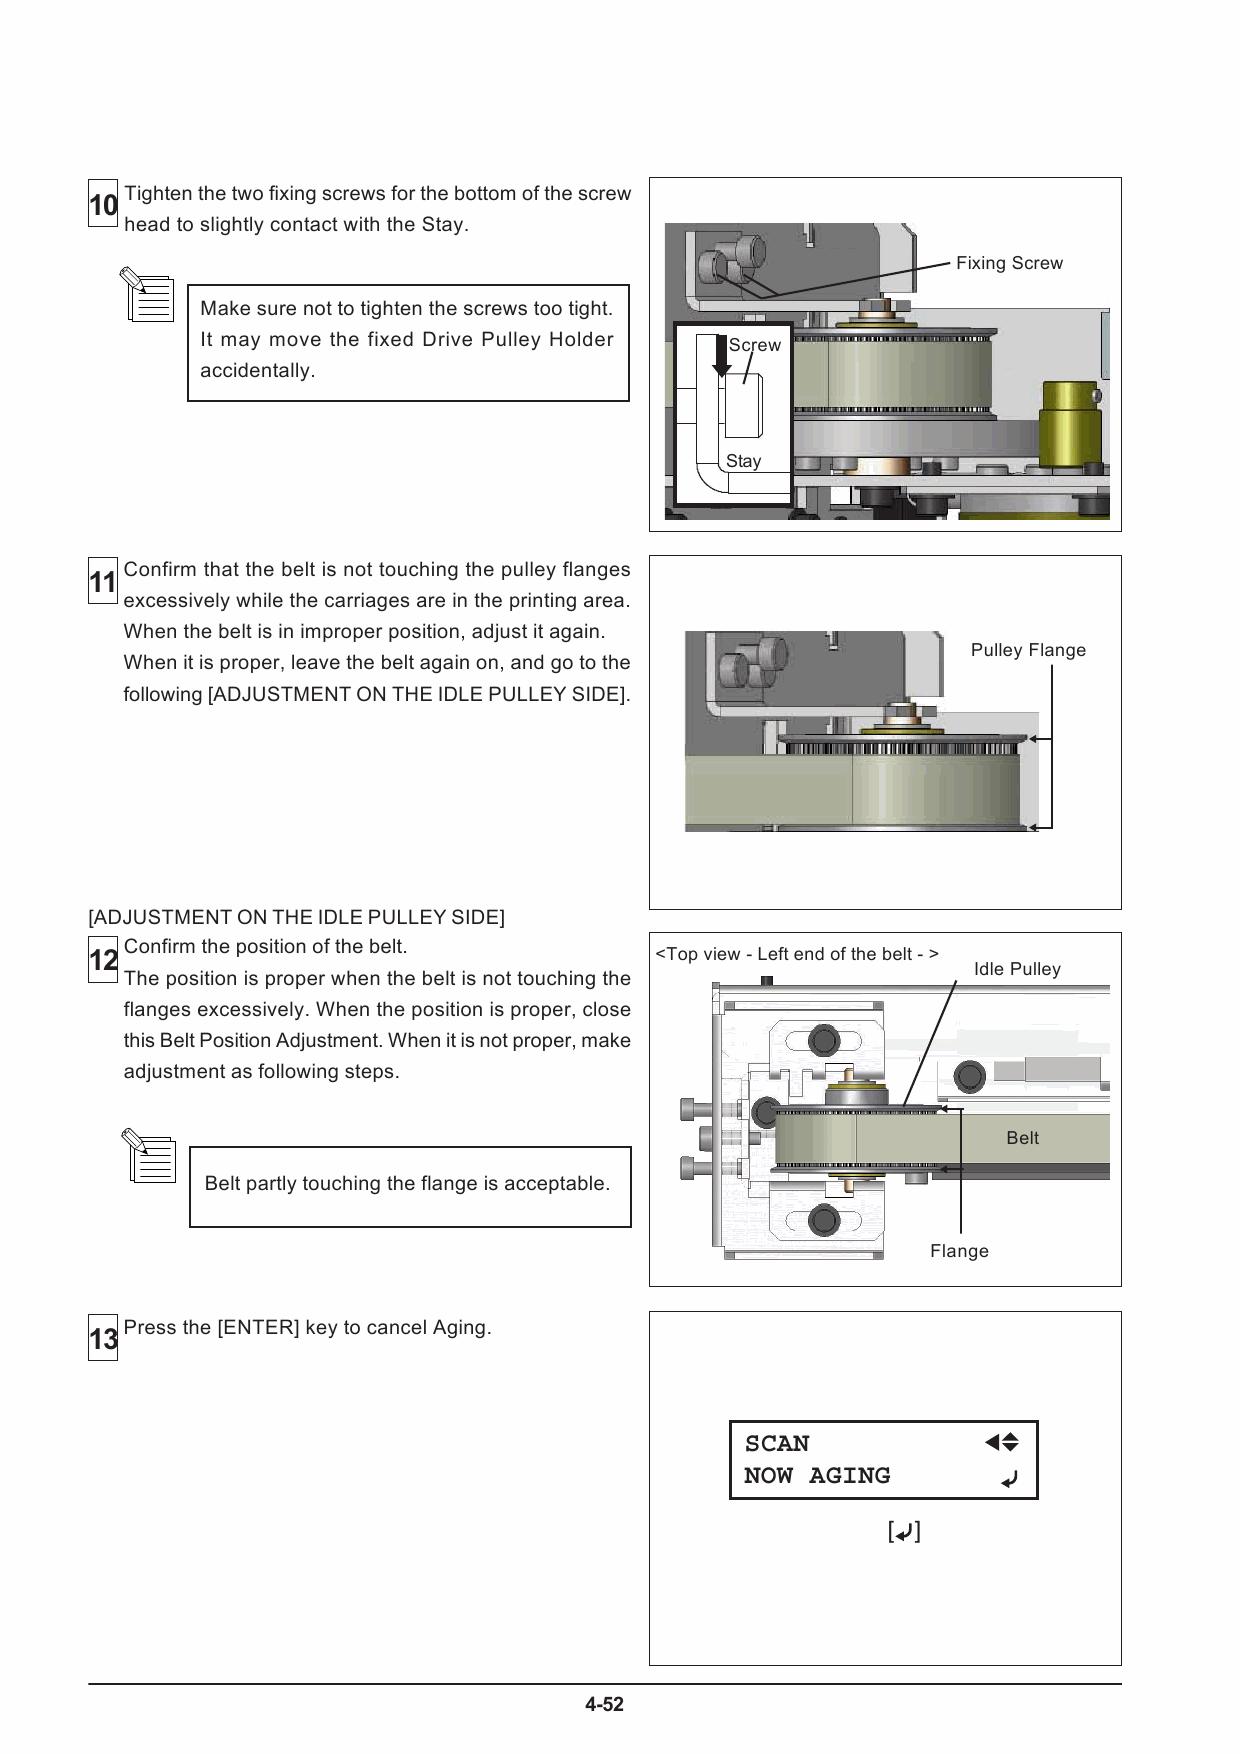 Roland soljet pro3 xj 740 640 540 service notes manual 6